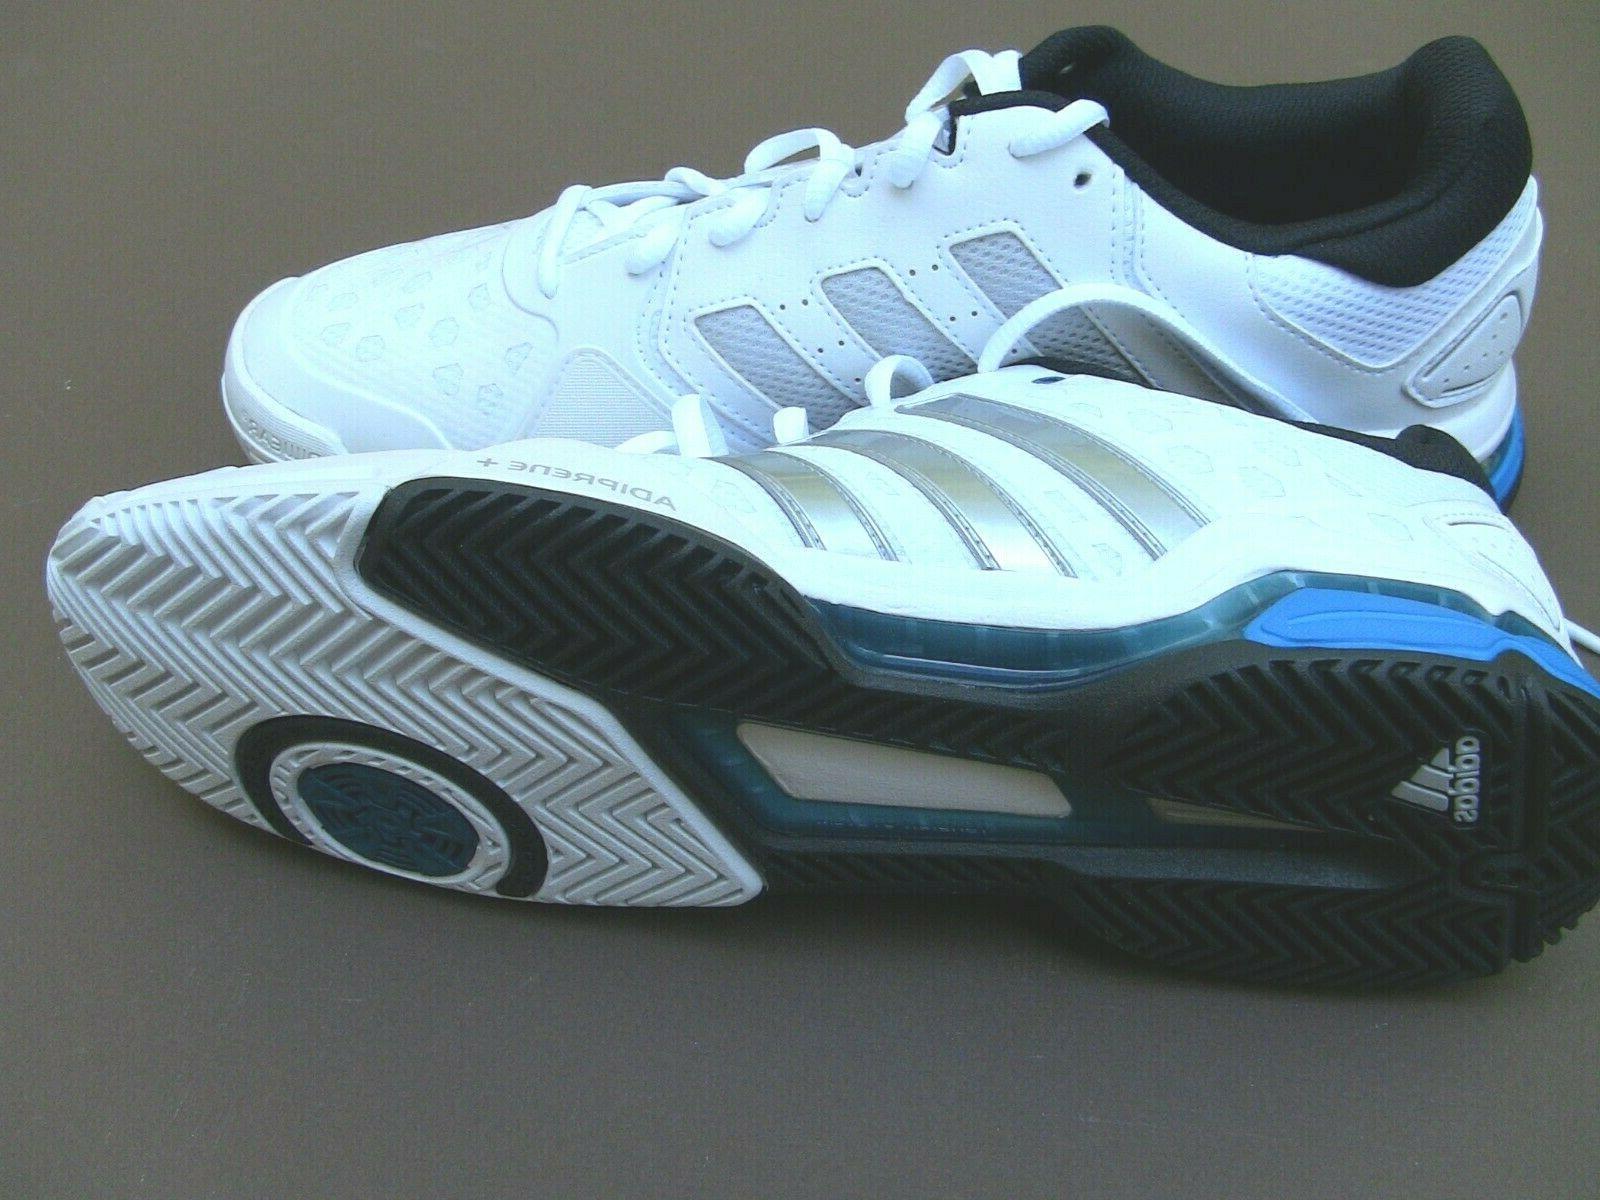 Tennis shoes brand in box Club !0